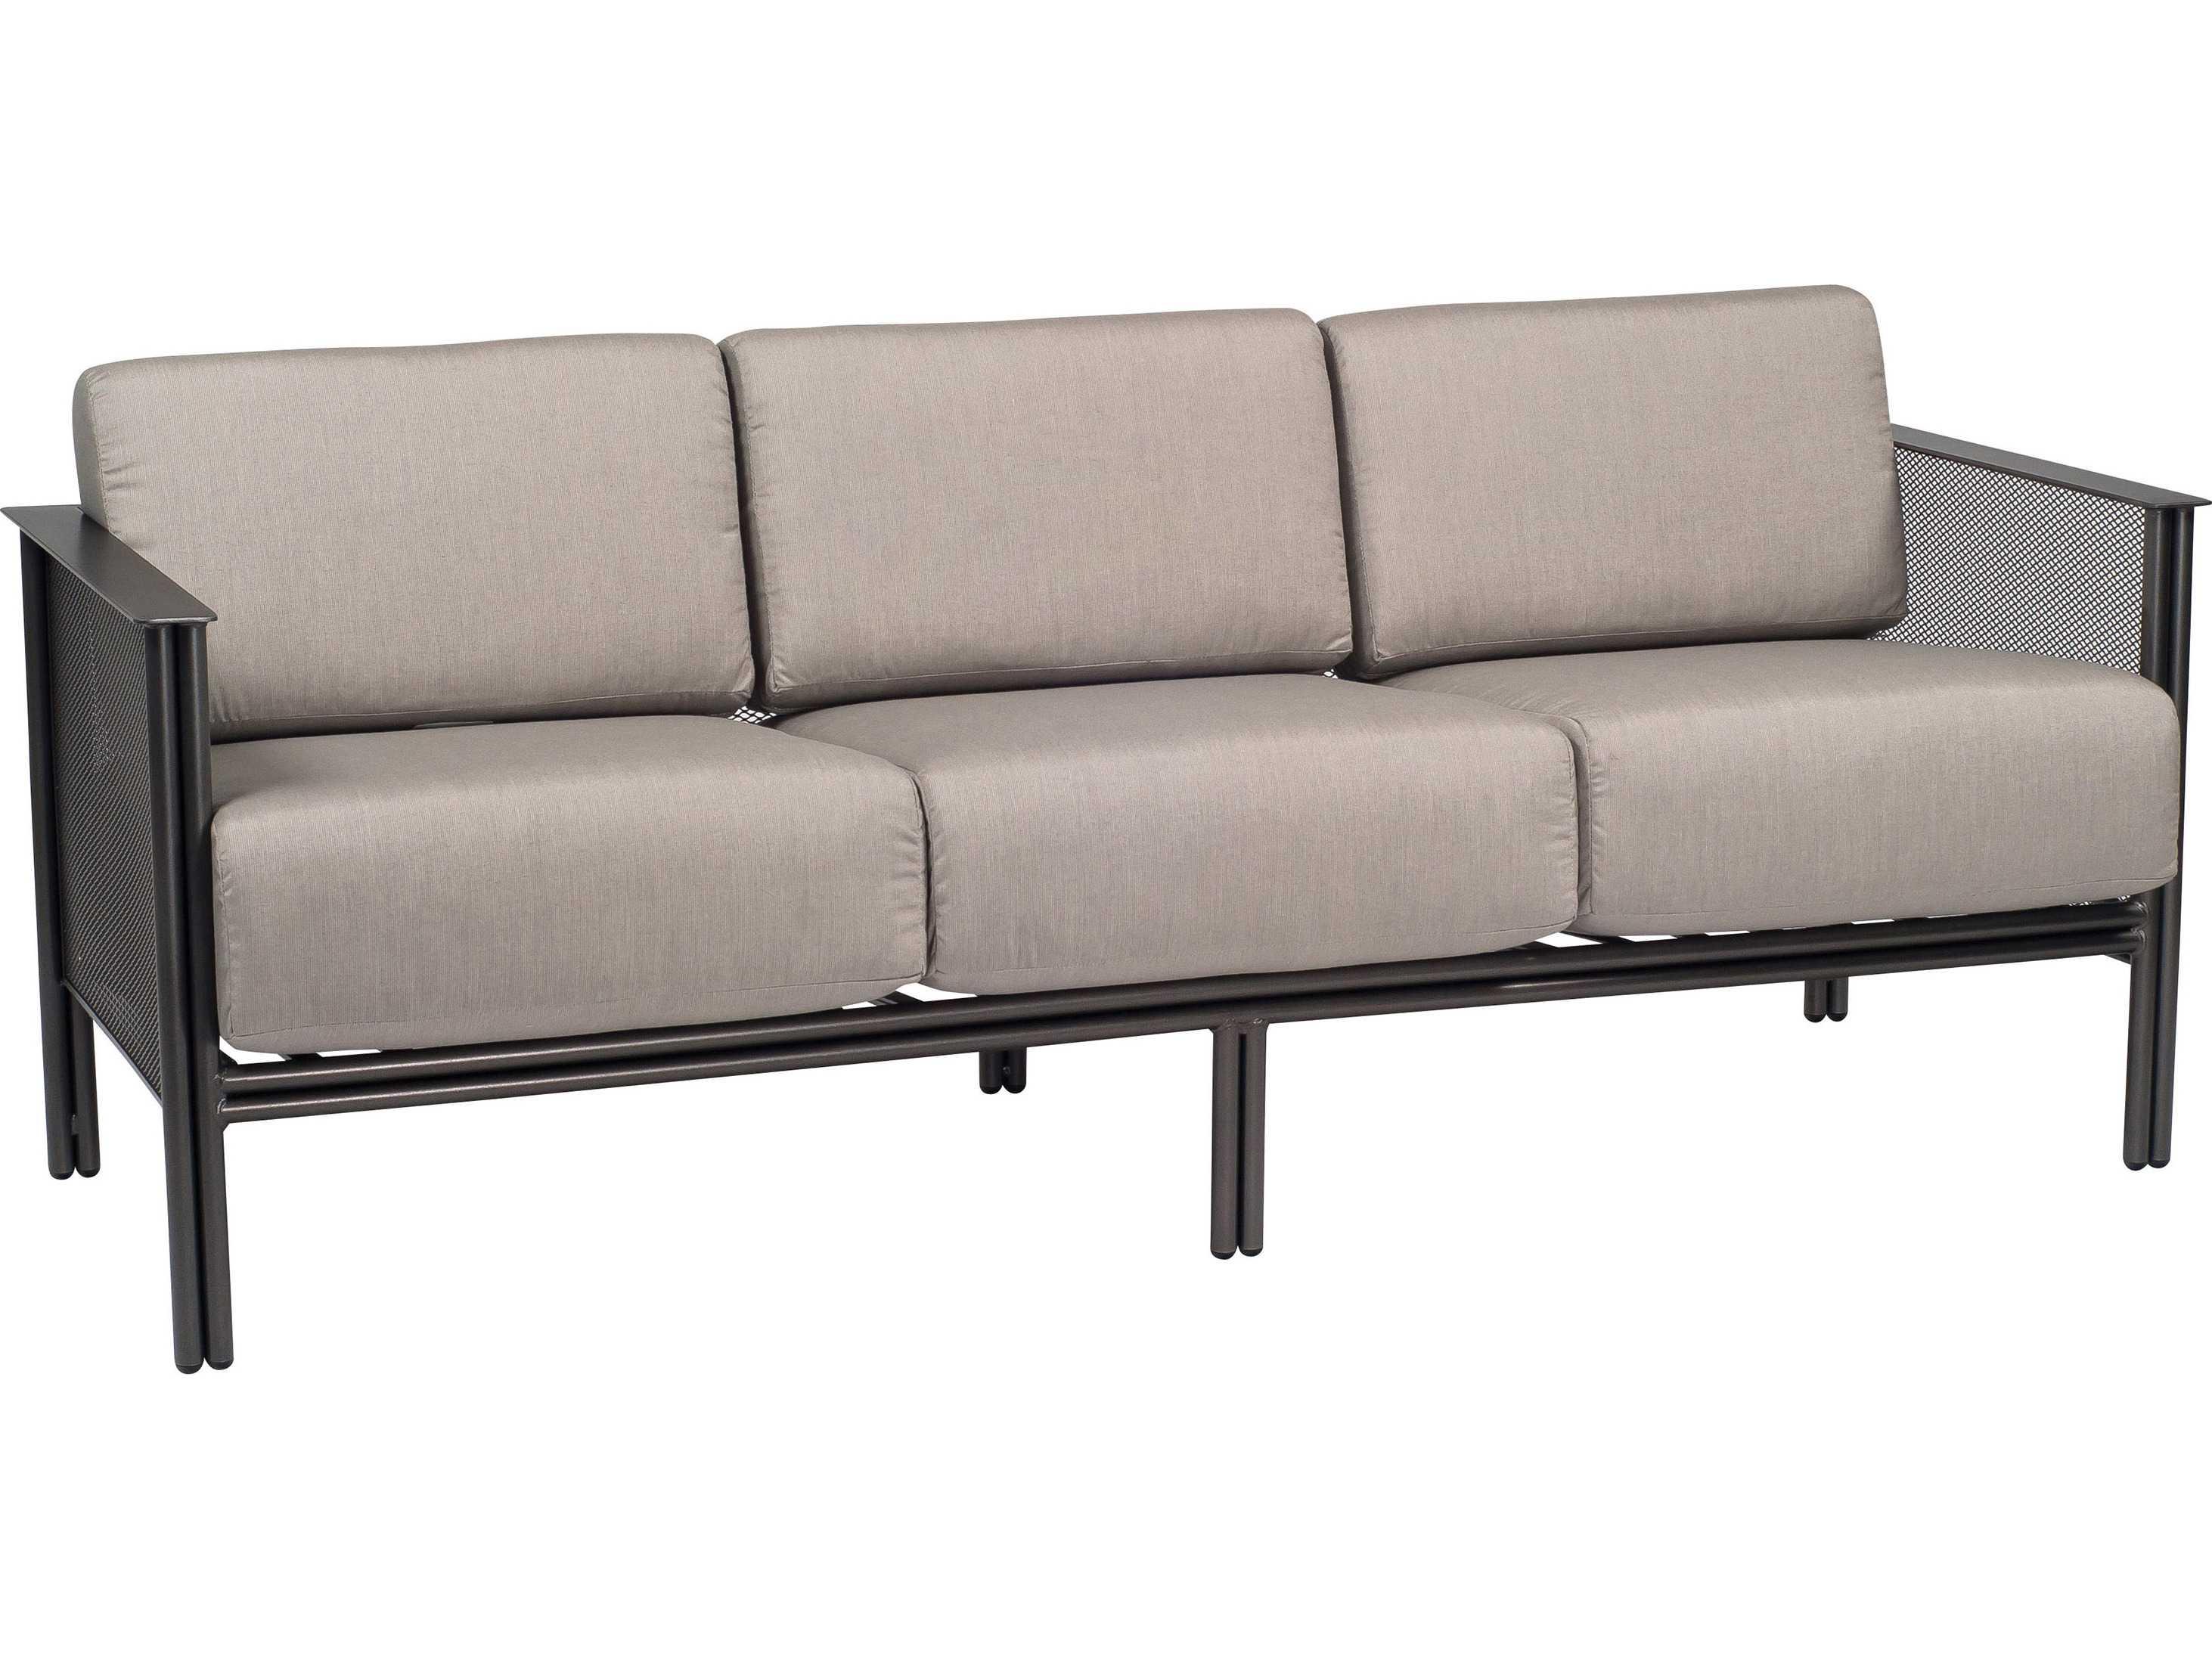 Woodard Jax Wrought Iron Sofa 2j0020